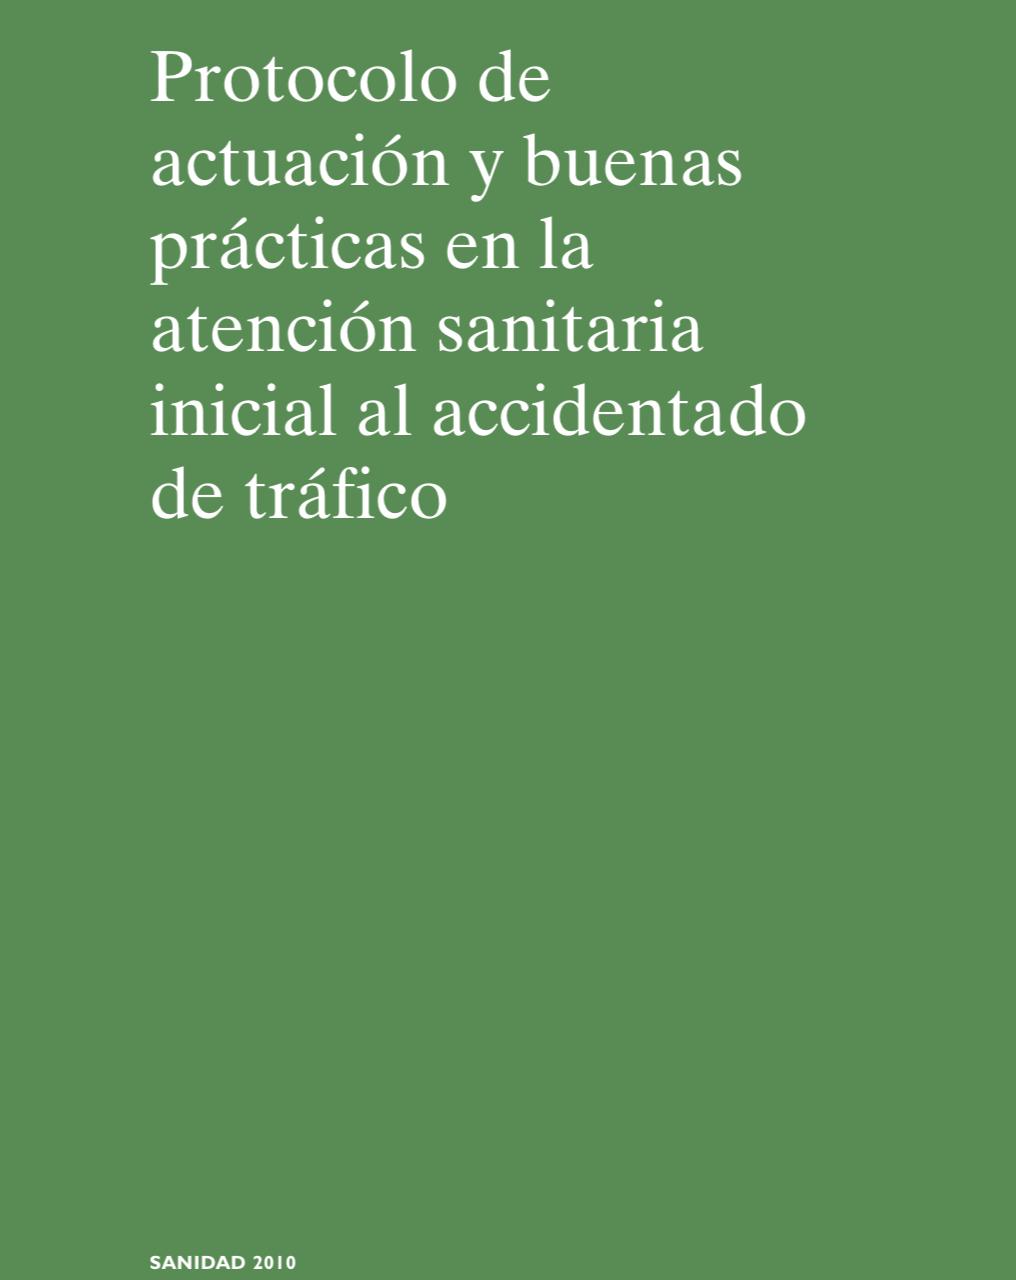 https://artemergencia.es/wp-content/uploads/2018/05/portada-protocolo-semes-1016x1280.png